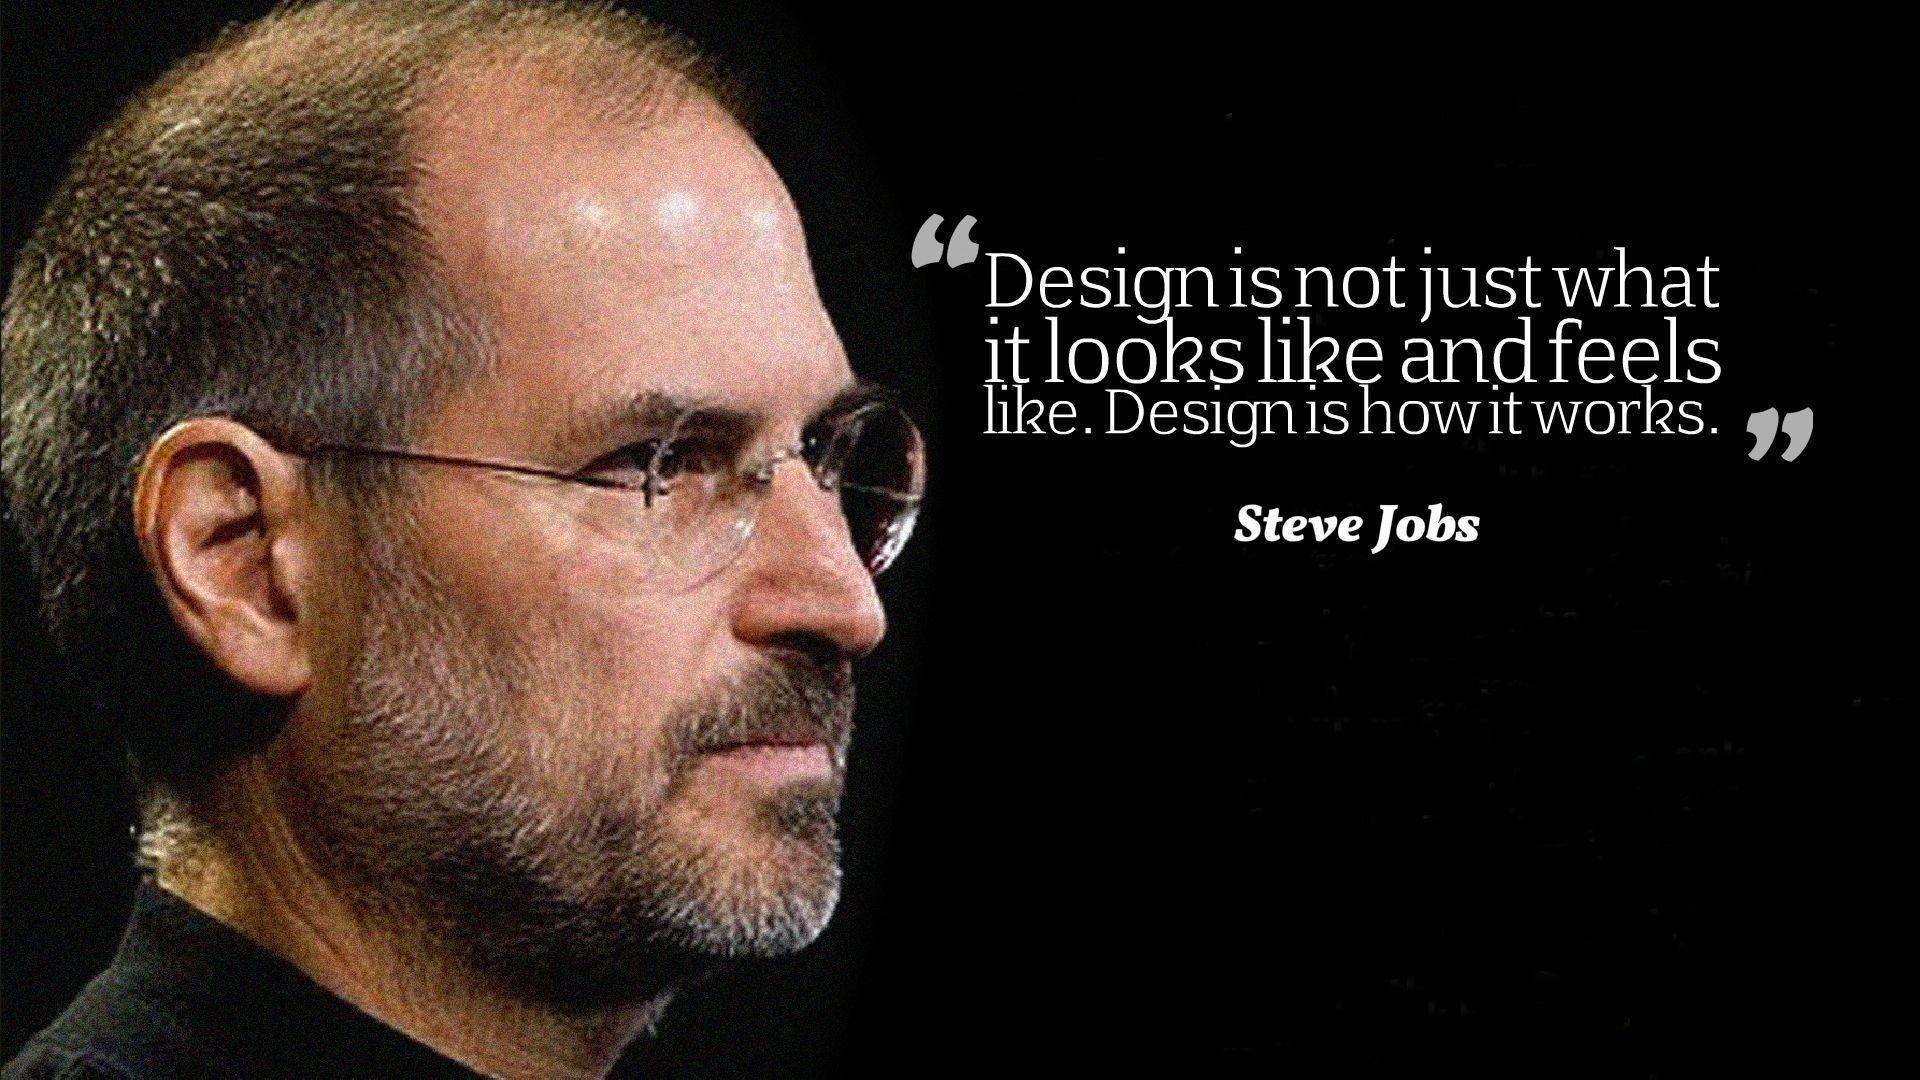 Steve Jobs wallpaper image hd